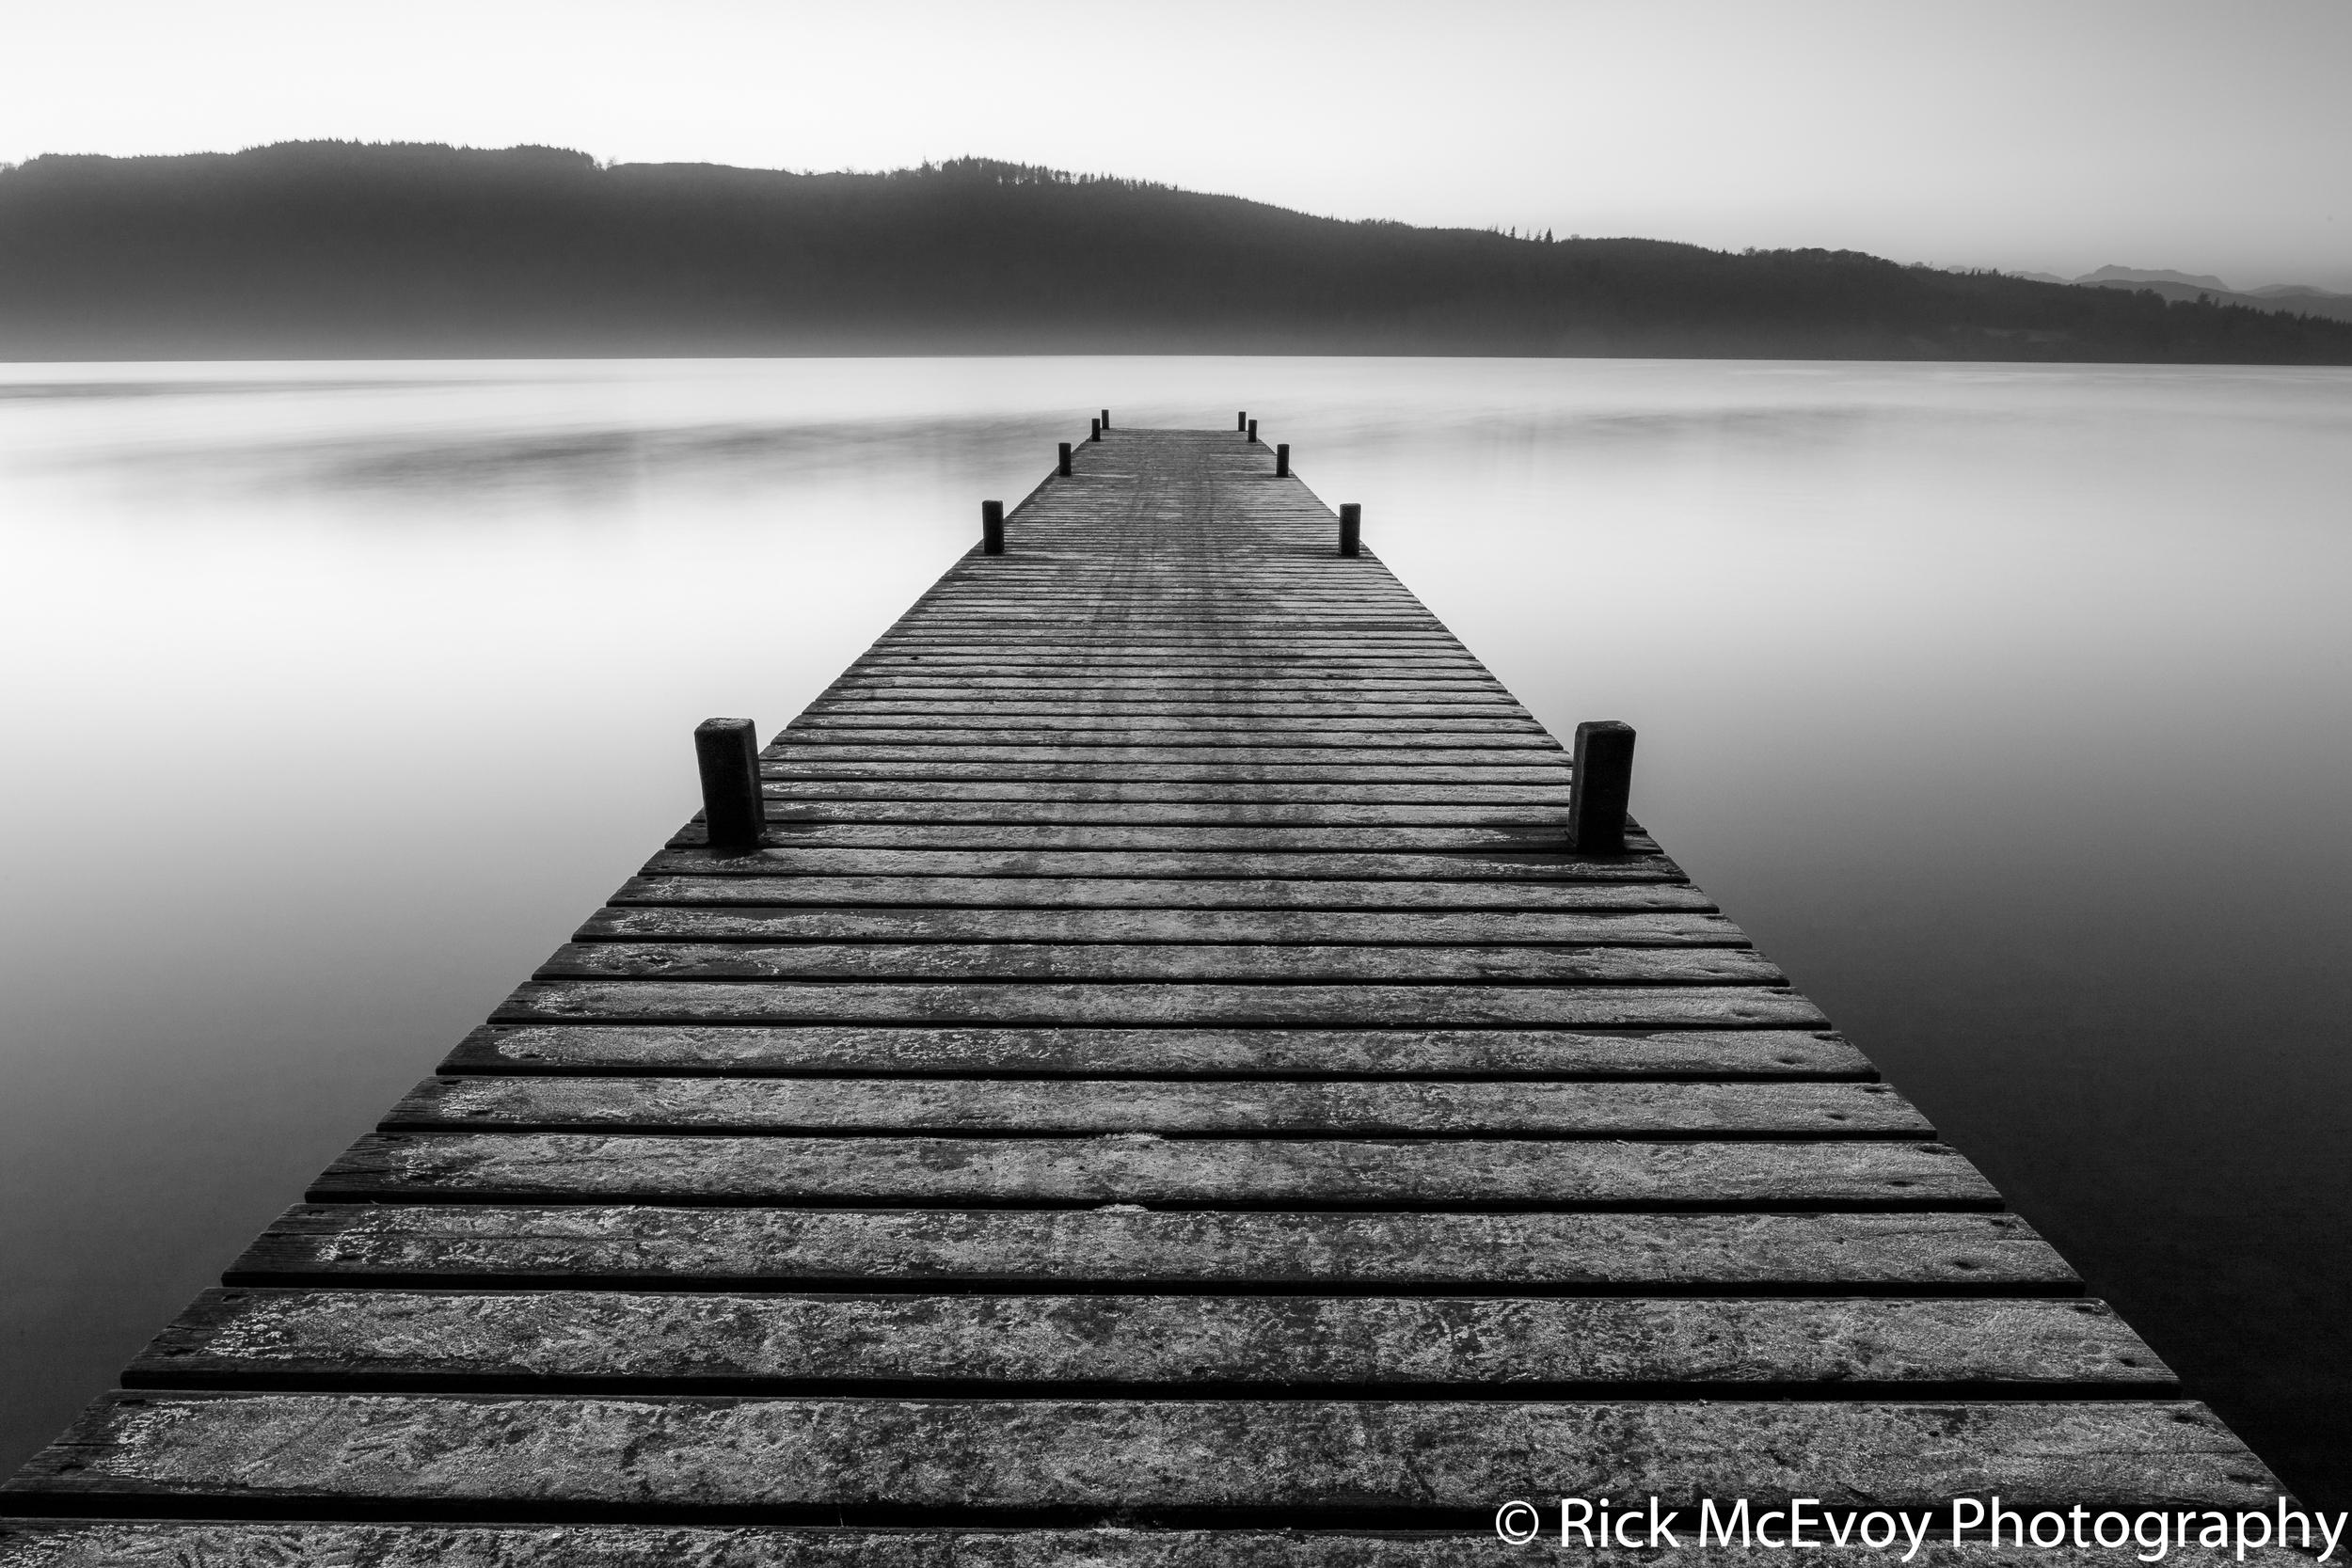 Jetty, Lake Windermere, Lake District, Cumbria, by professional photographer Rick McEvoy